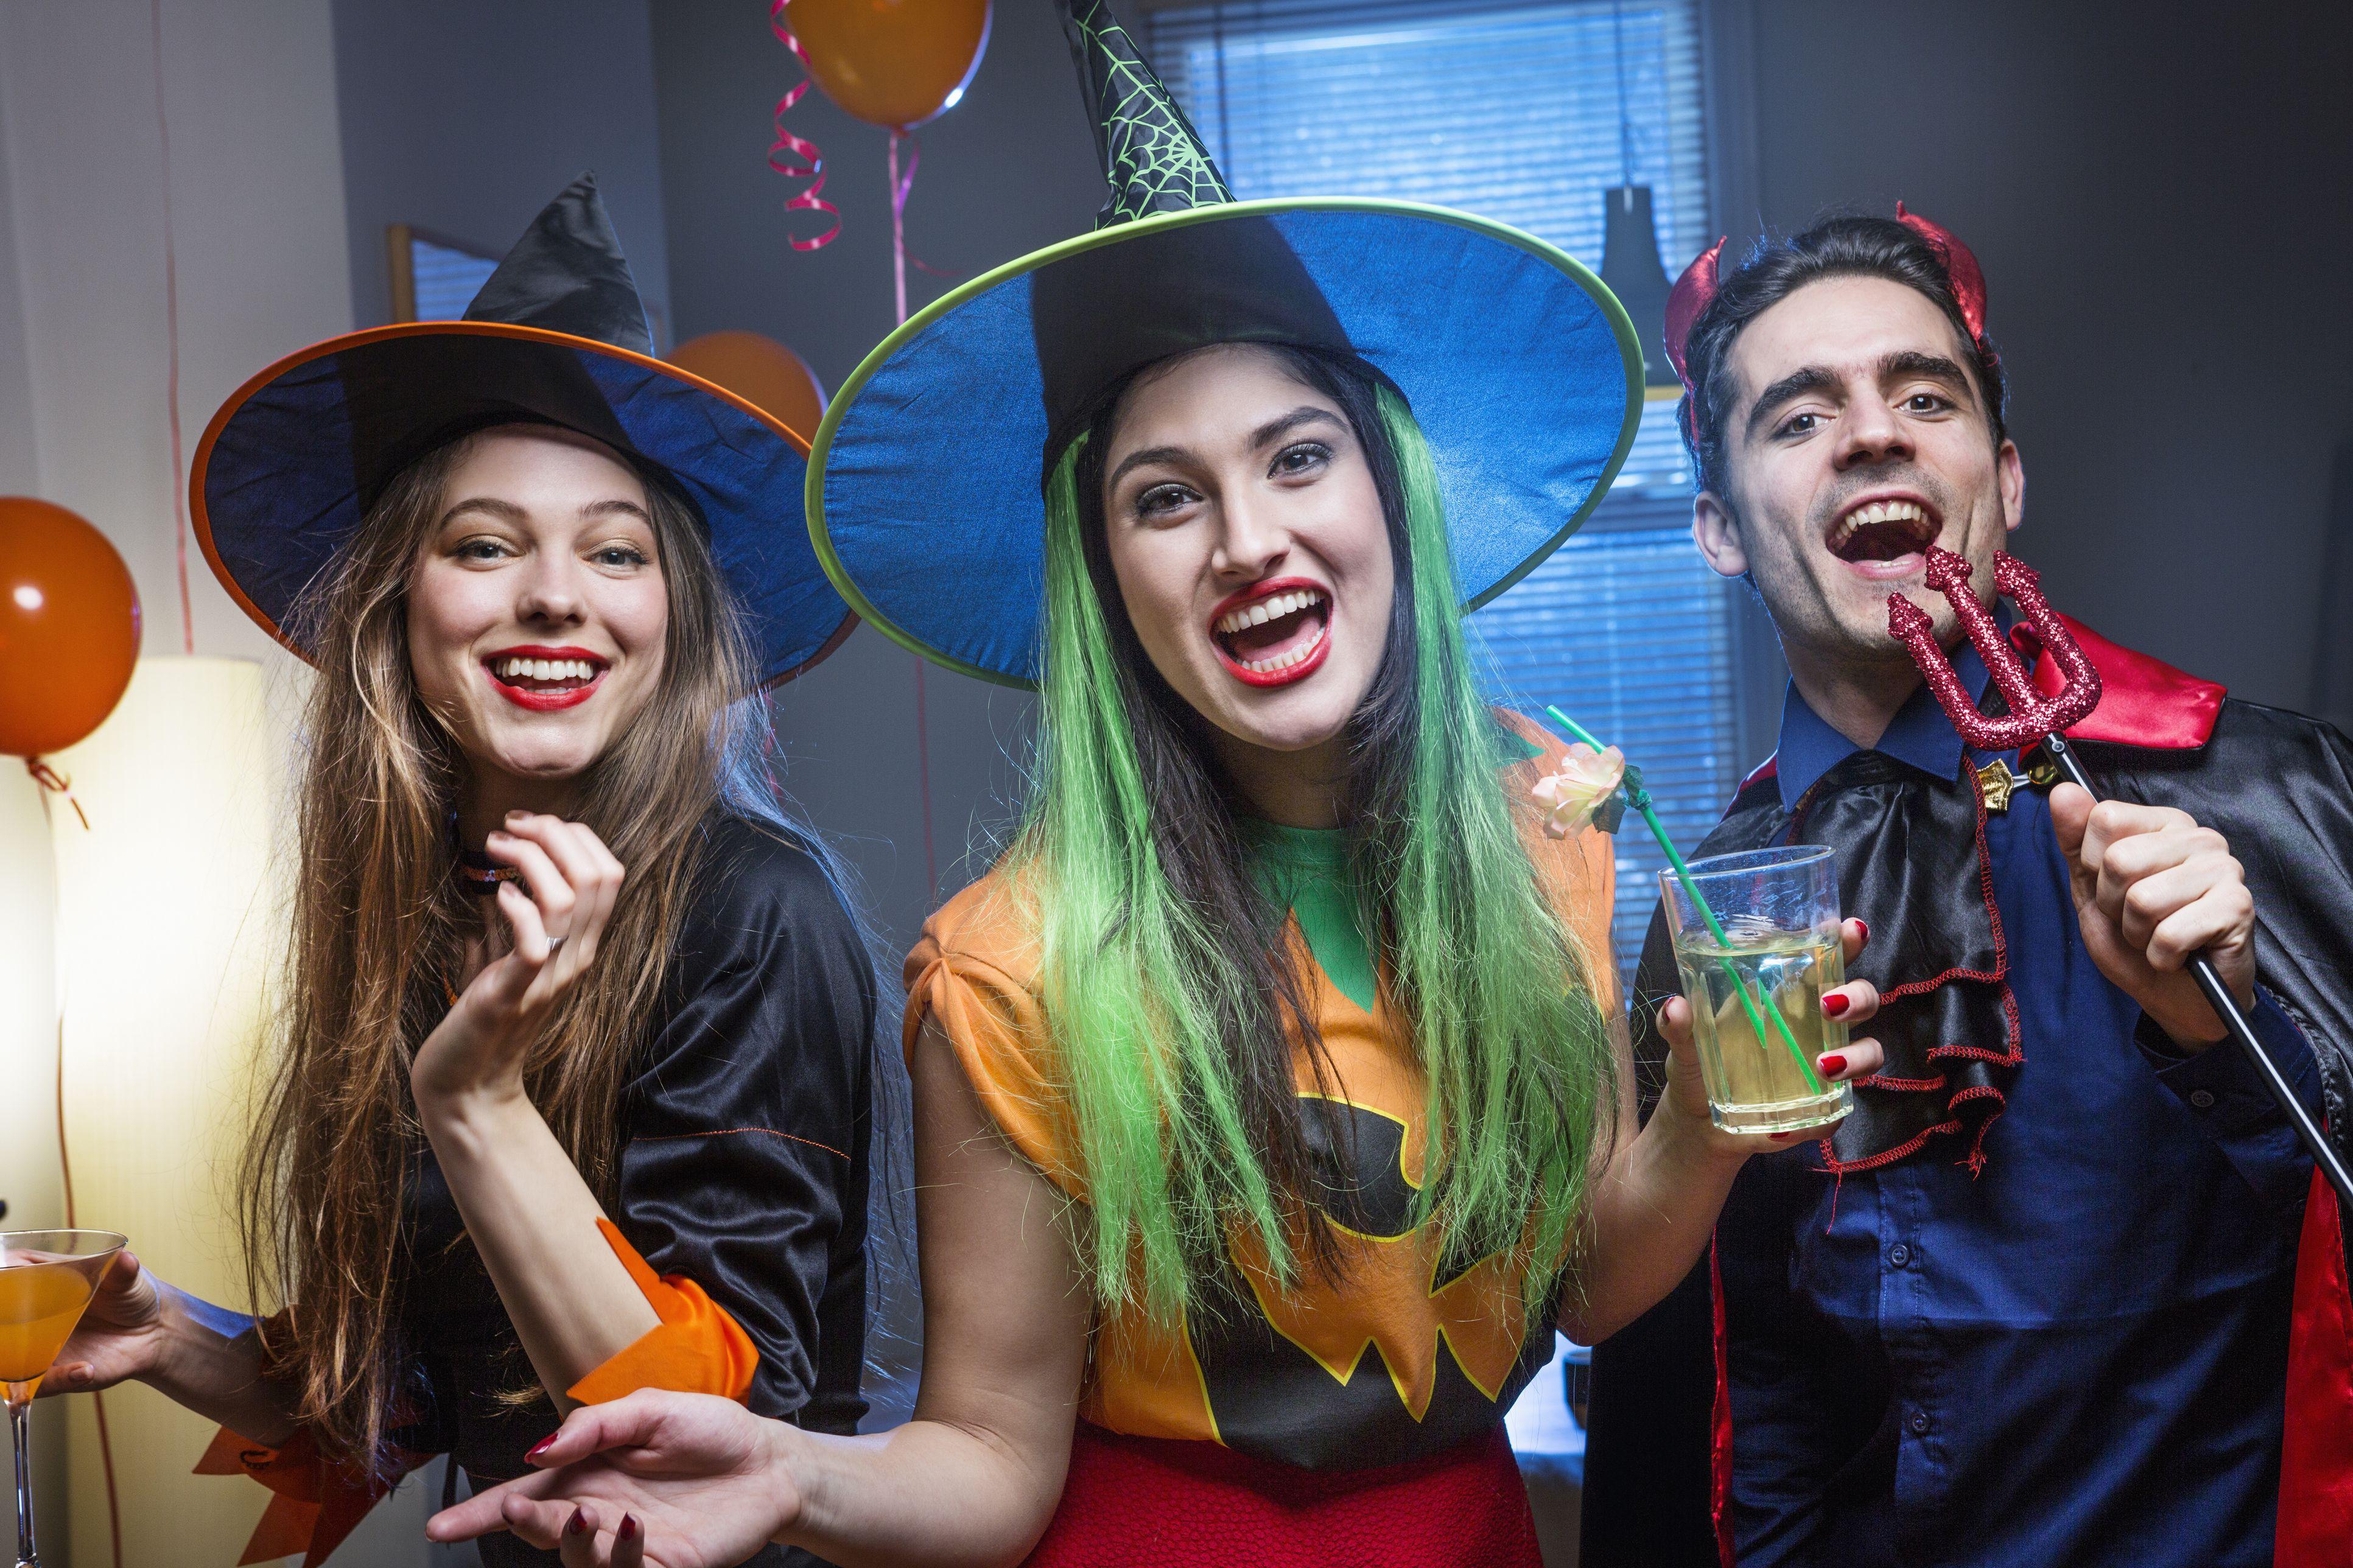 spooky fun halloween music for everyone - Halloween Wav Files